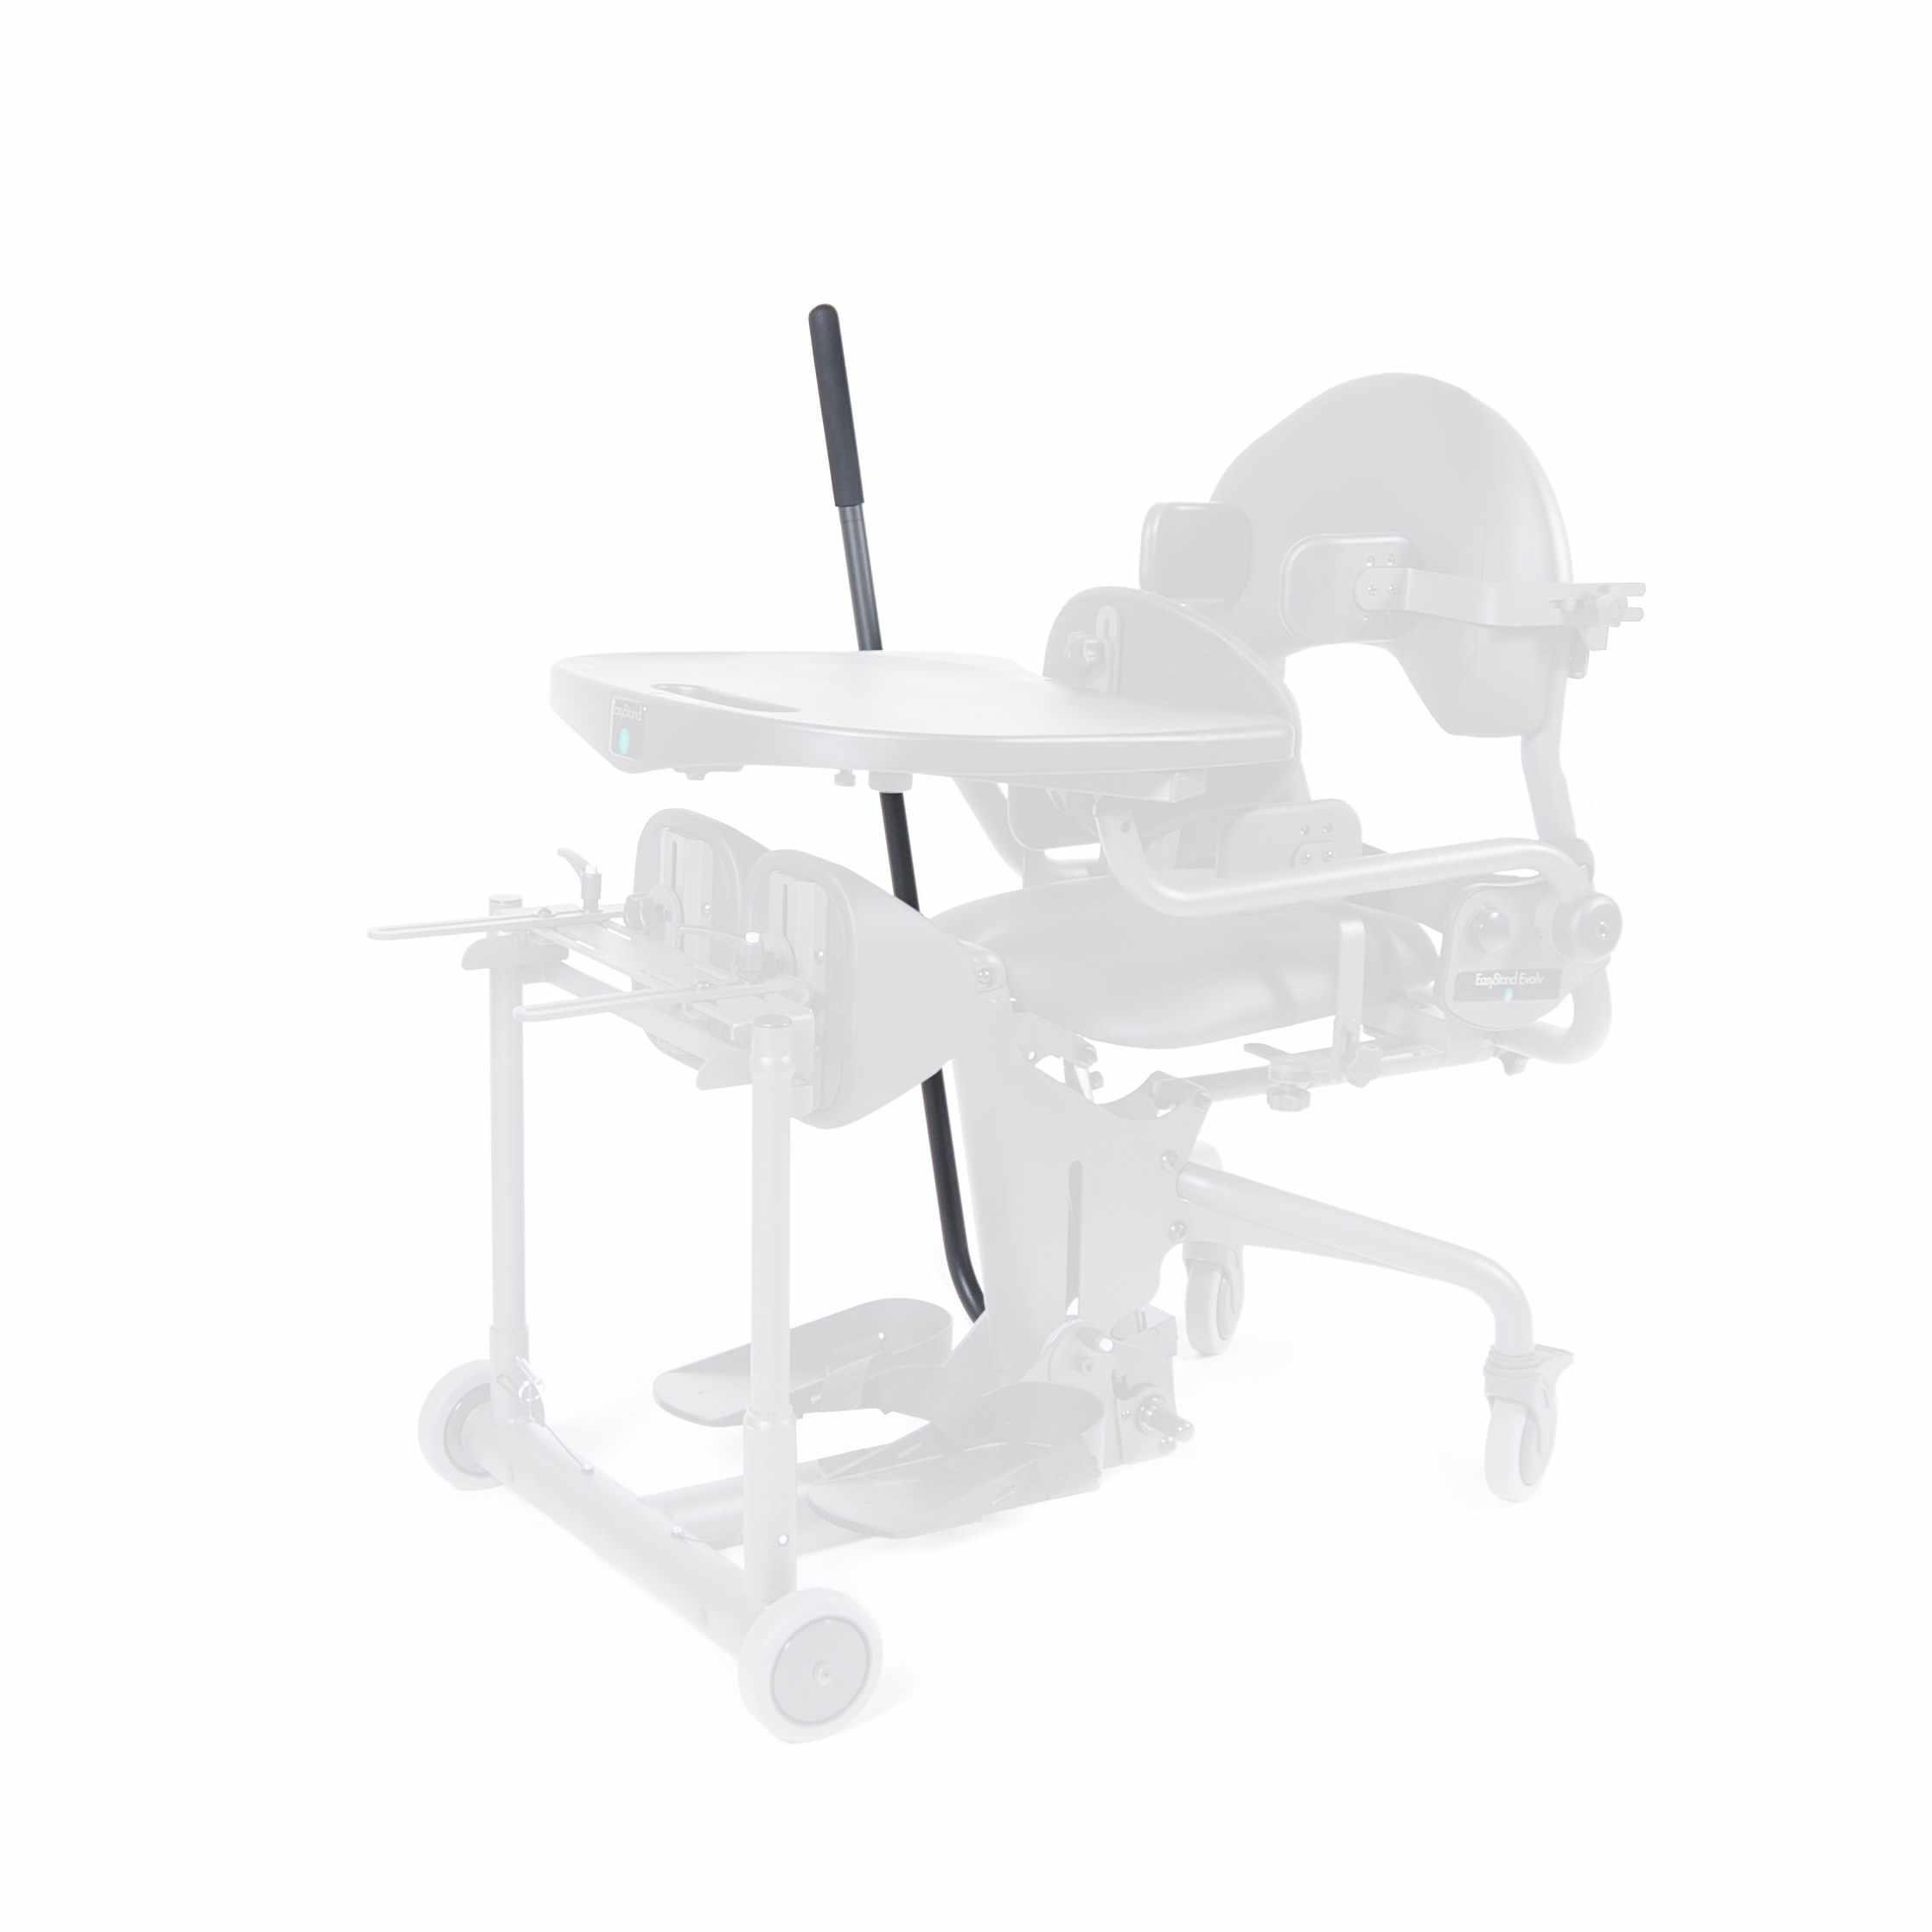 Easystand actuator handle